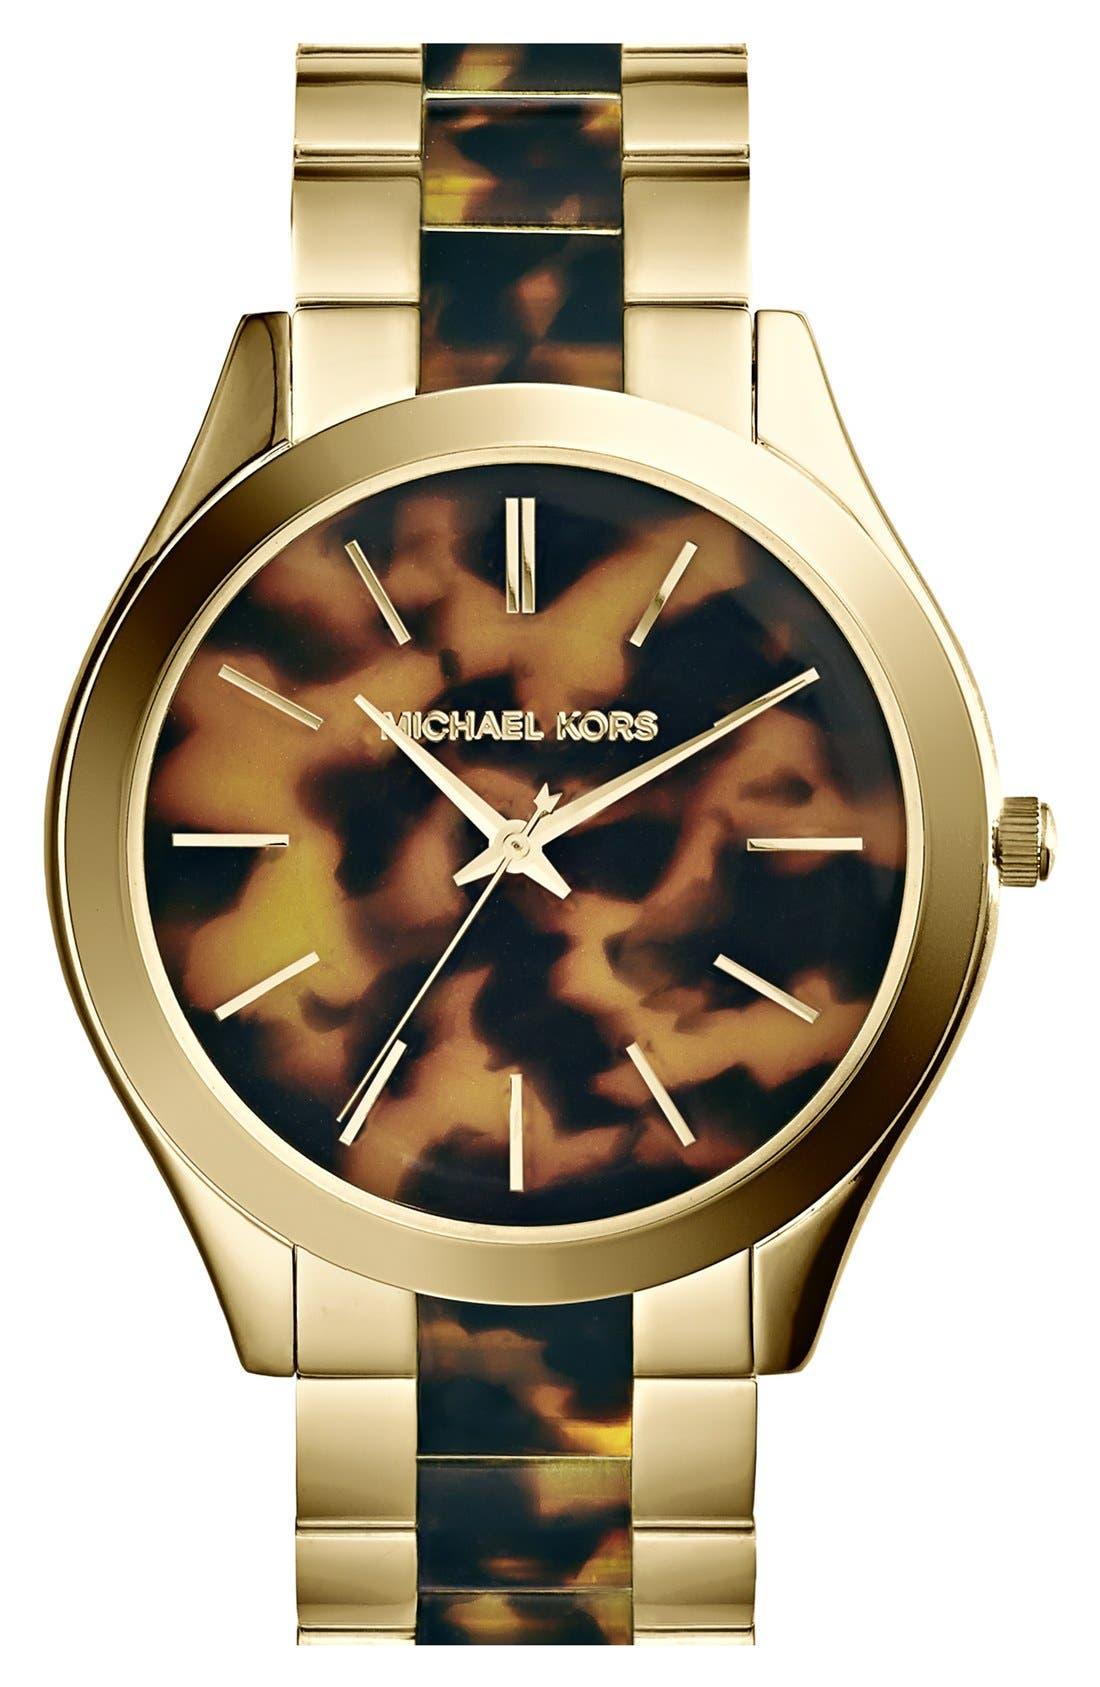 Michael Kors 'Slim Runway' Round Bracelet Watch, 42mm,                             Main thumbnail 1, color,                             200